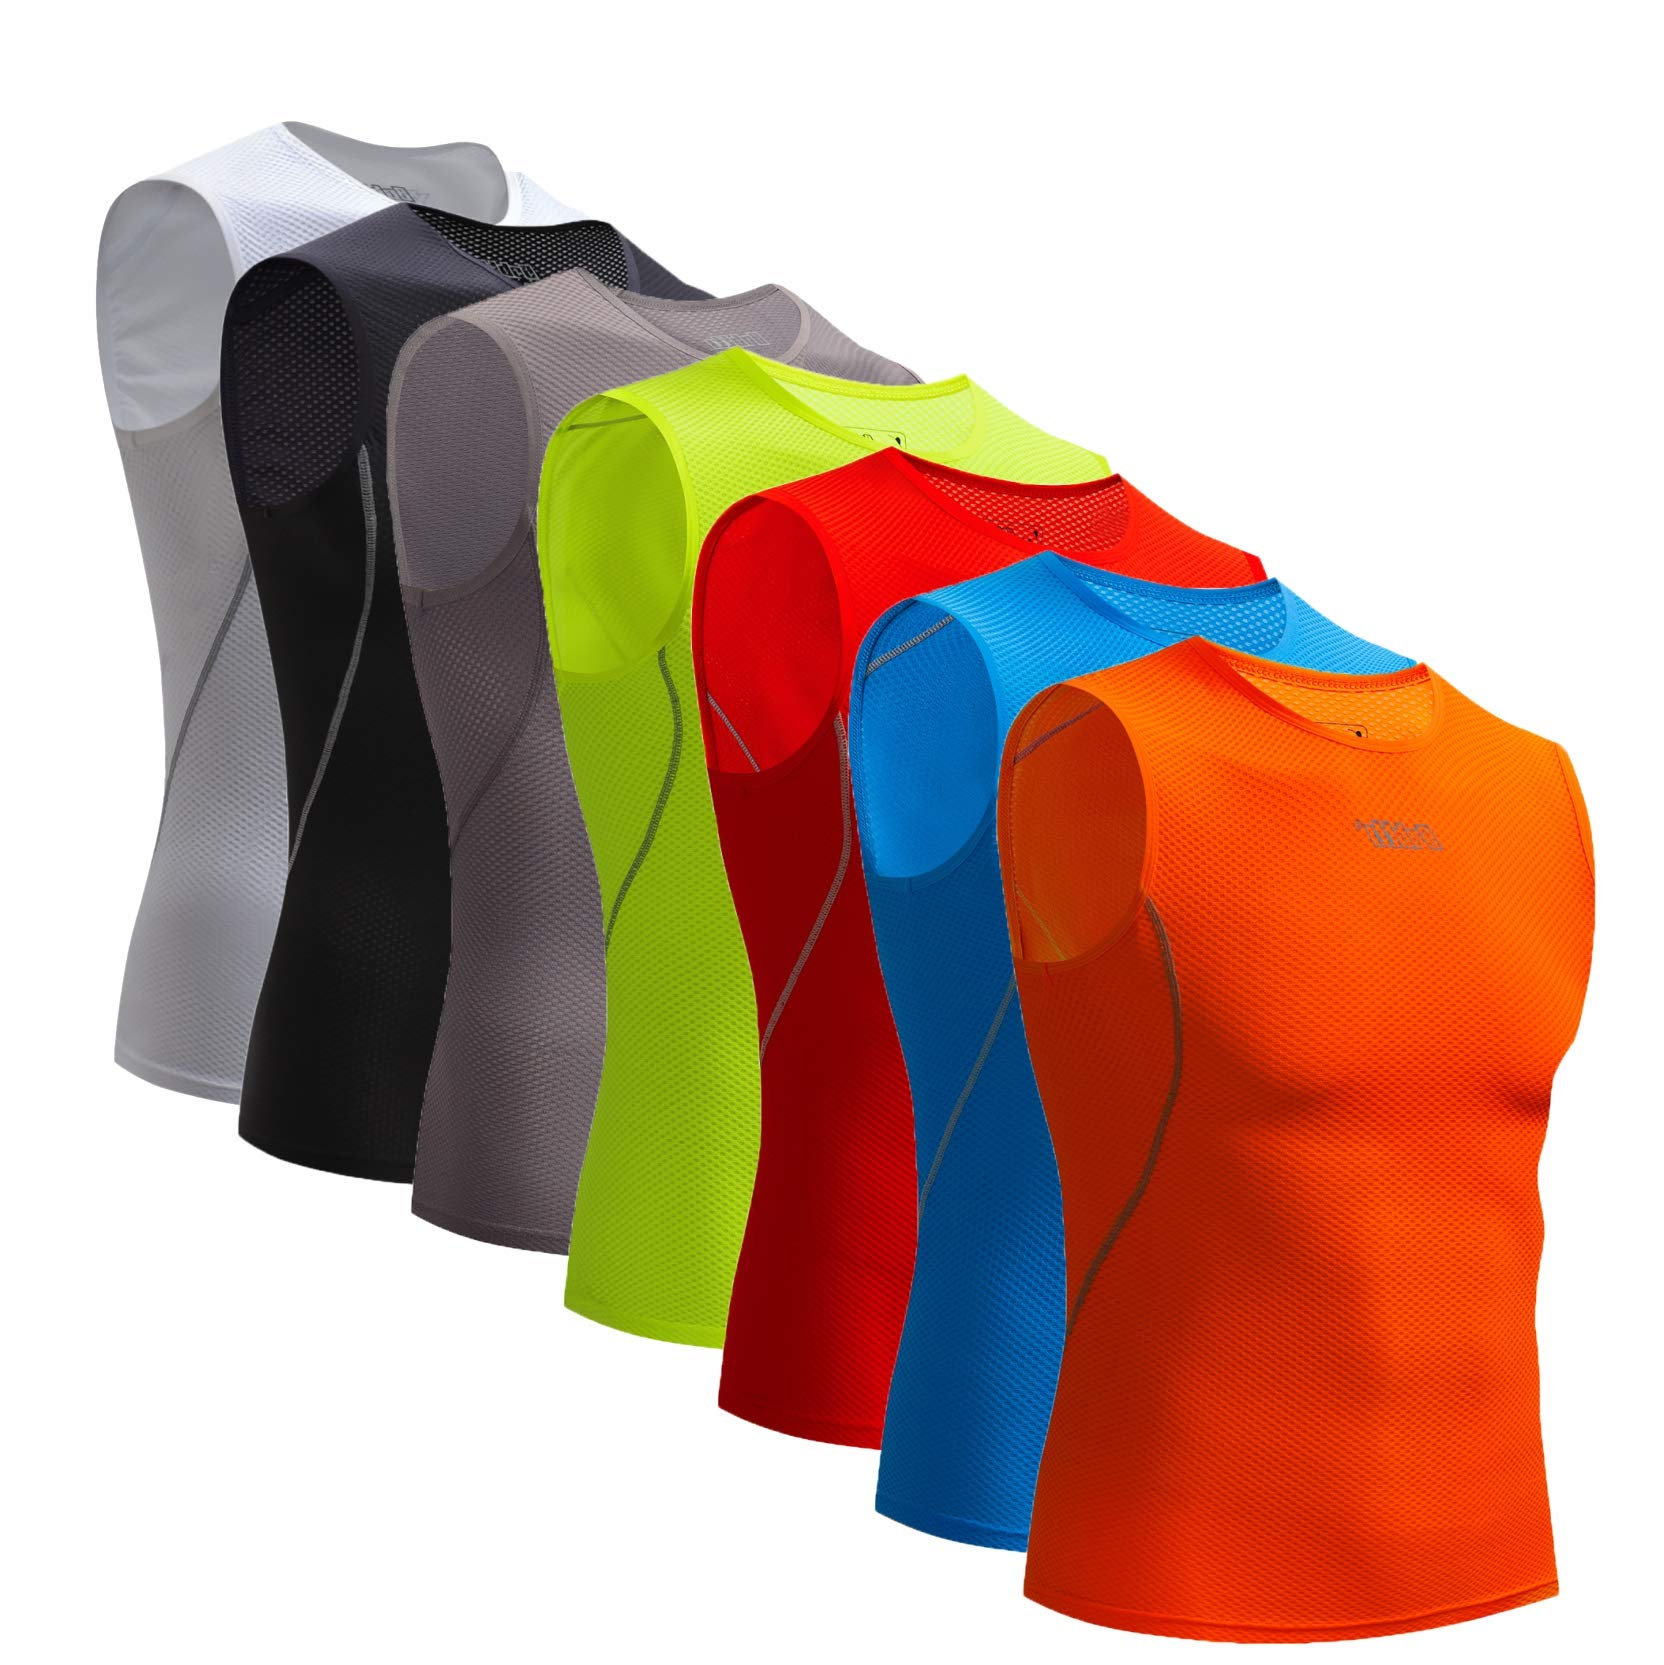 Bpbtti Men's Sleeveless Cycling Base Layer Bike Undershirt,Breathable,Superlight and Moisture Wicking (1 Pack Orange, Small)